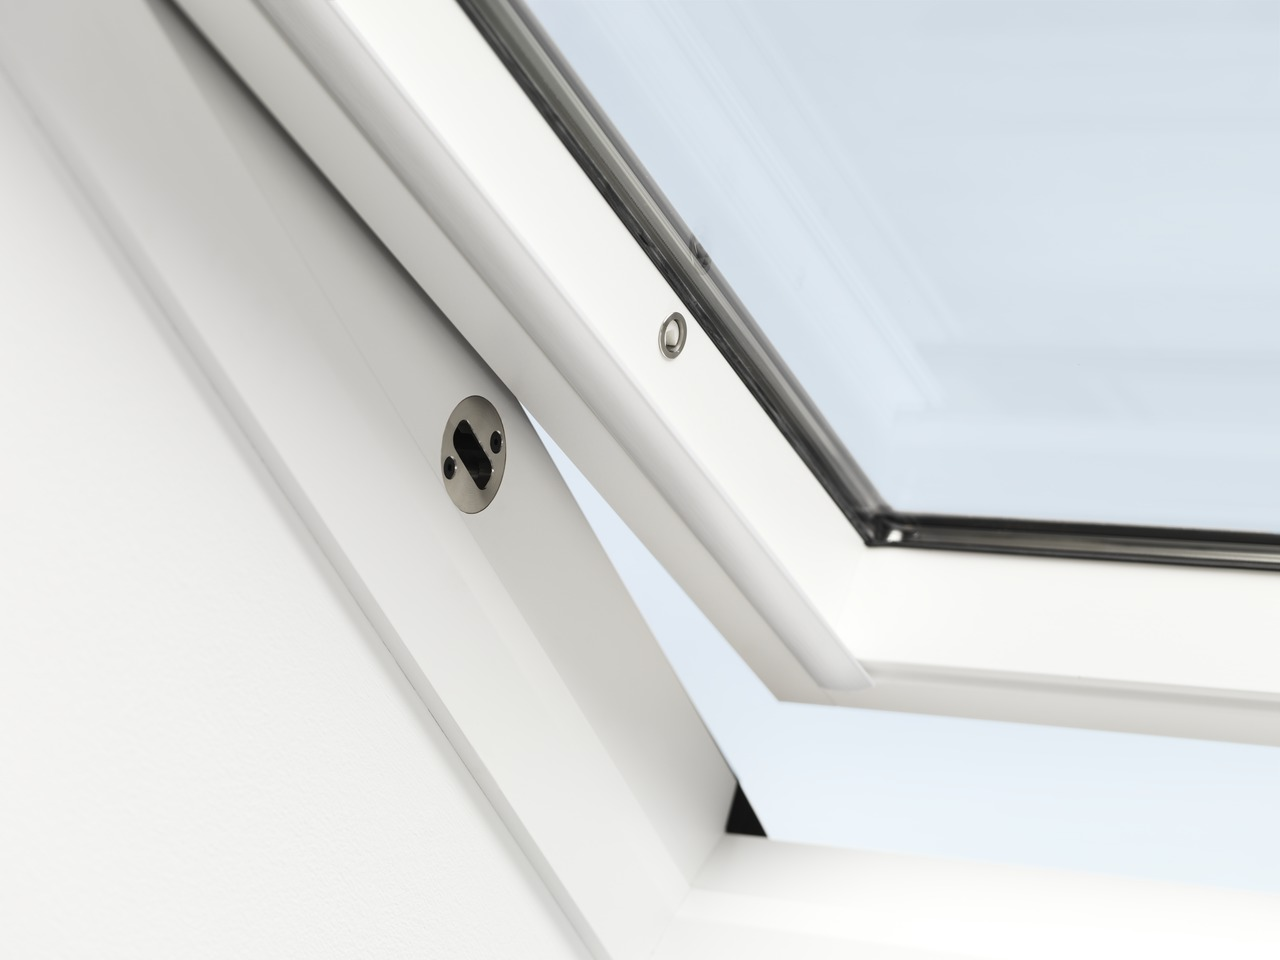 Finestre per tetti velux antieffrazione rivenditore velux - Dimensioni finestre velux ...